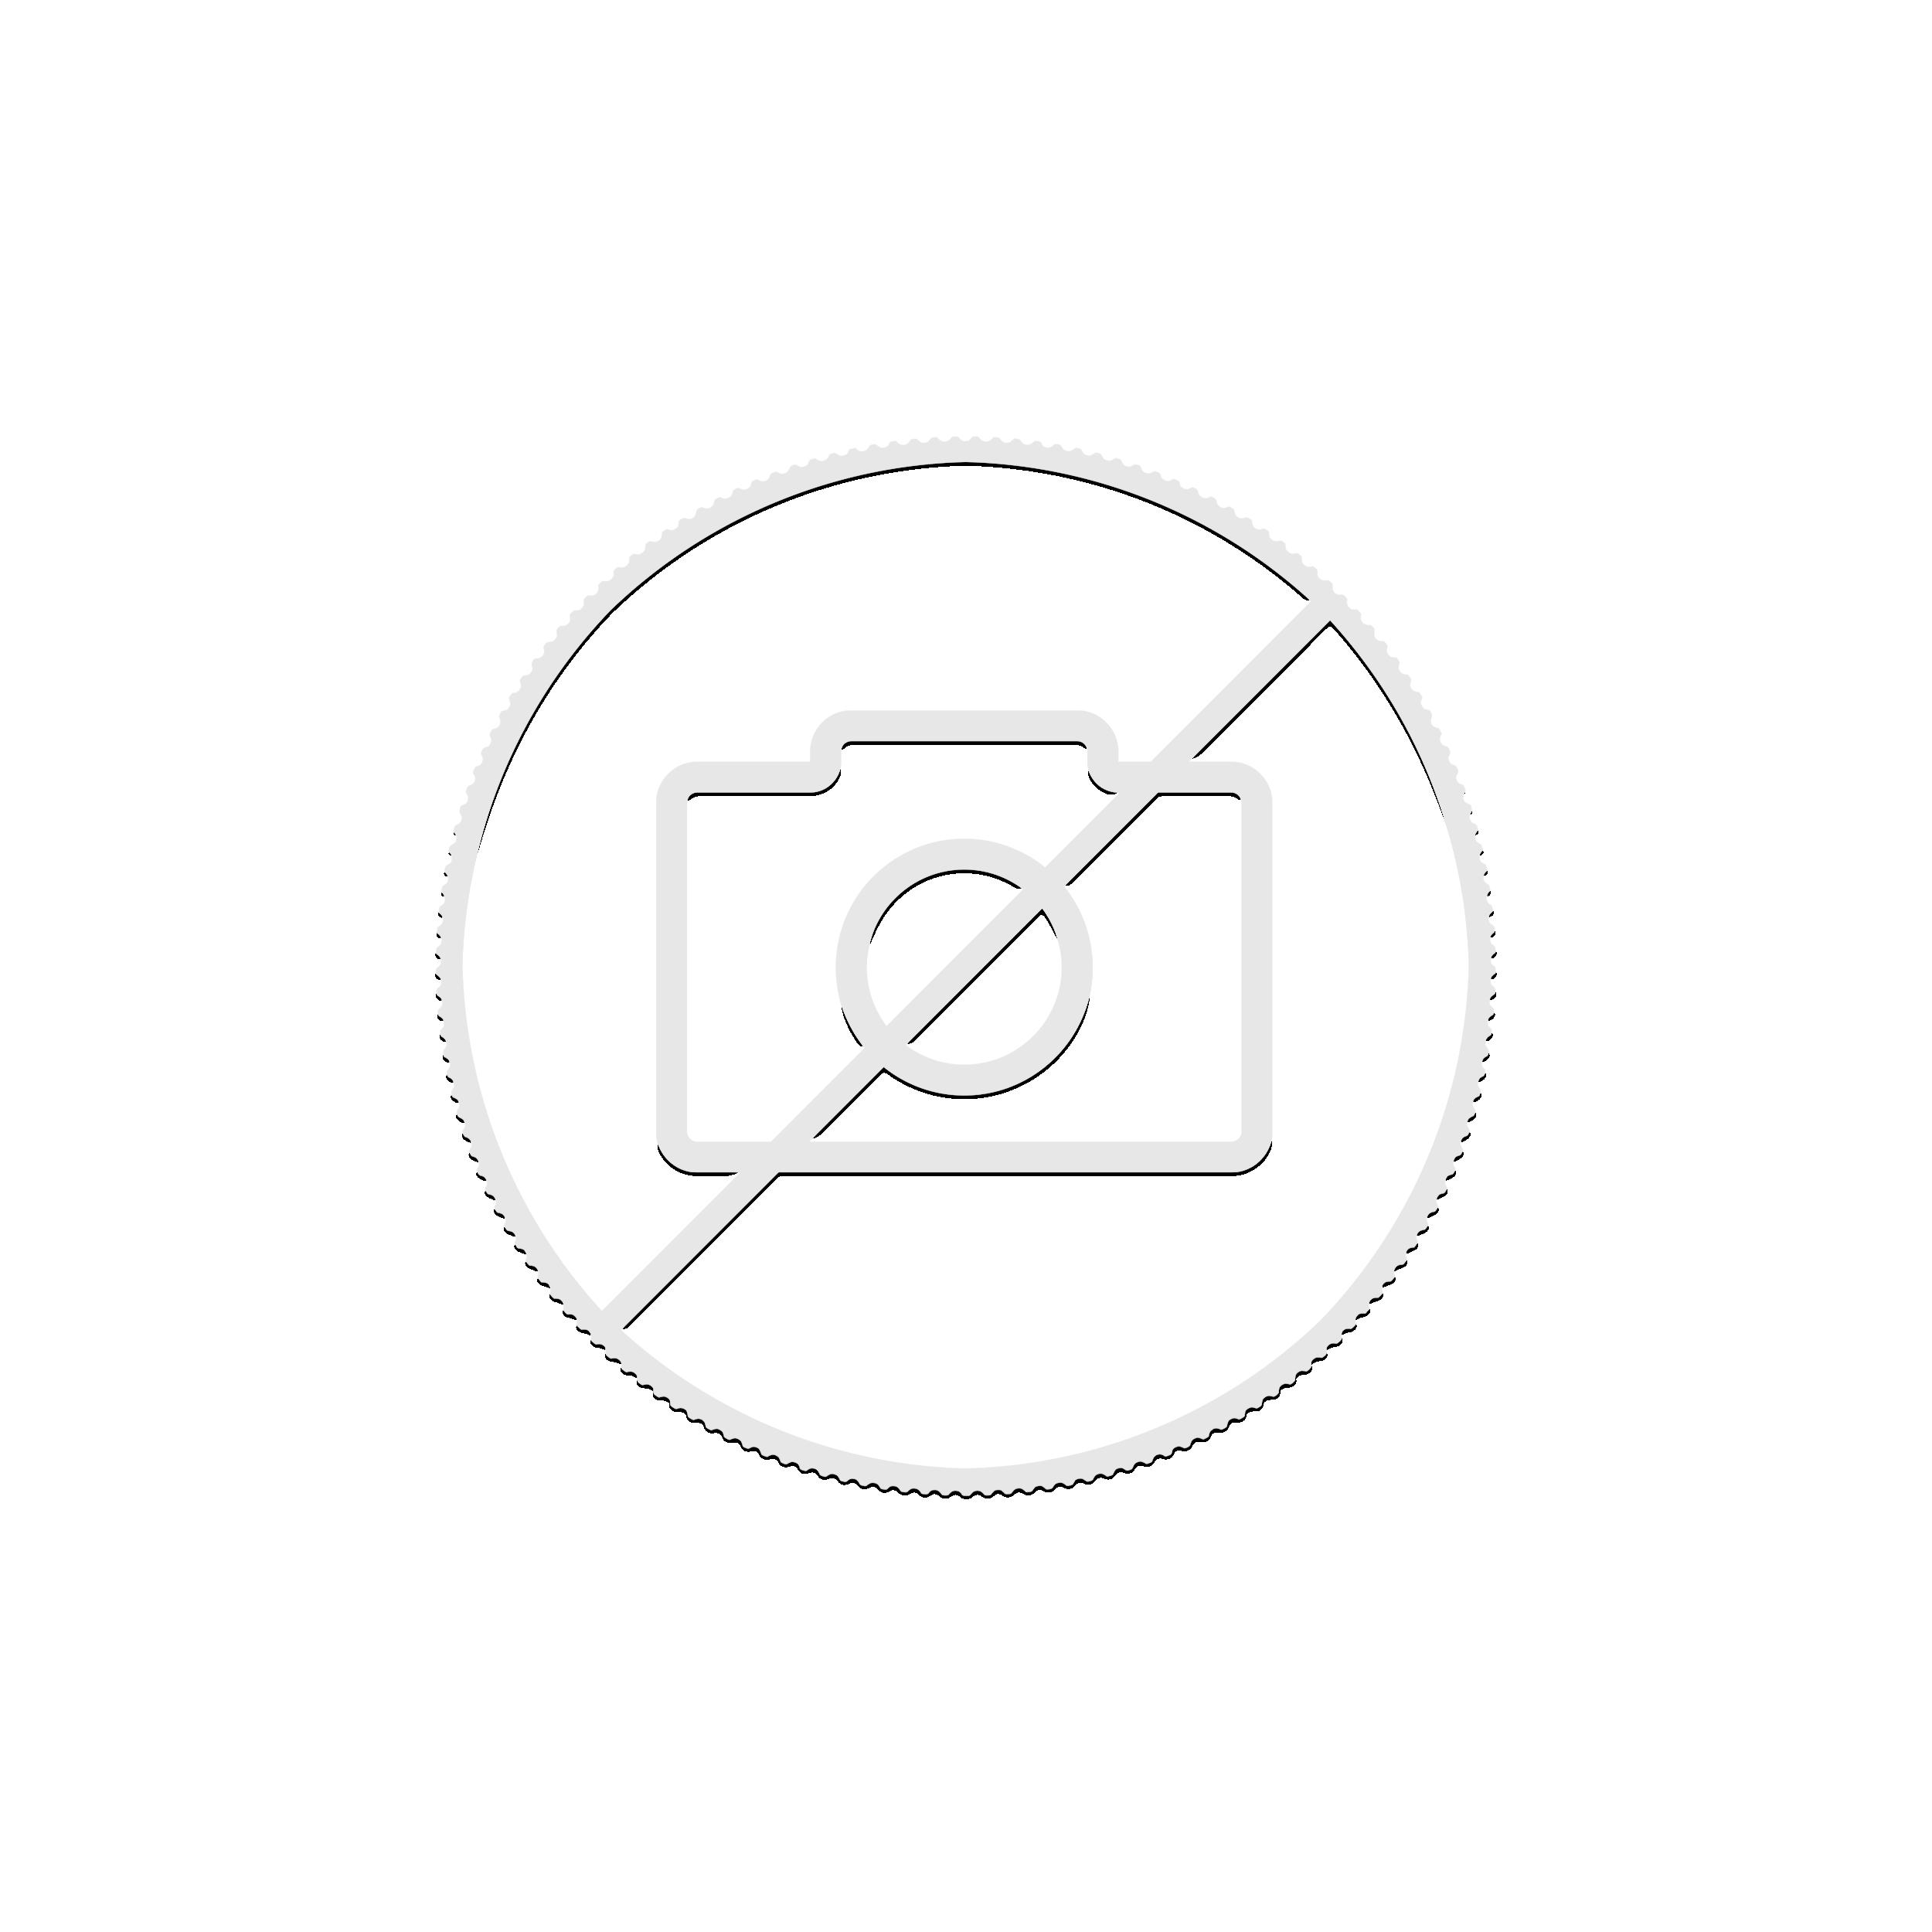 1 troy ounce gold American Buffalo 2019